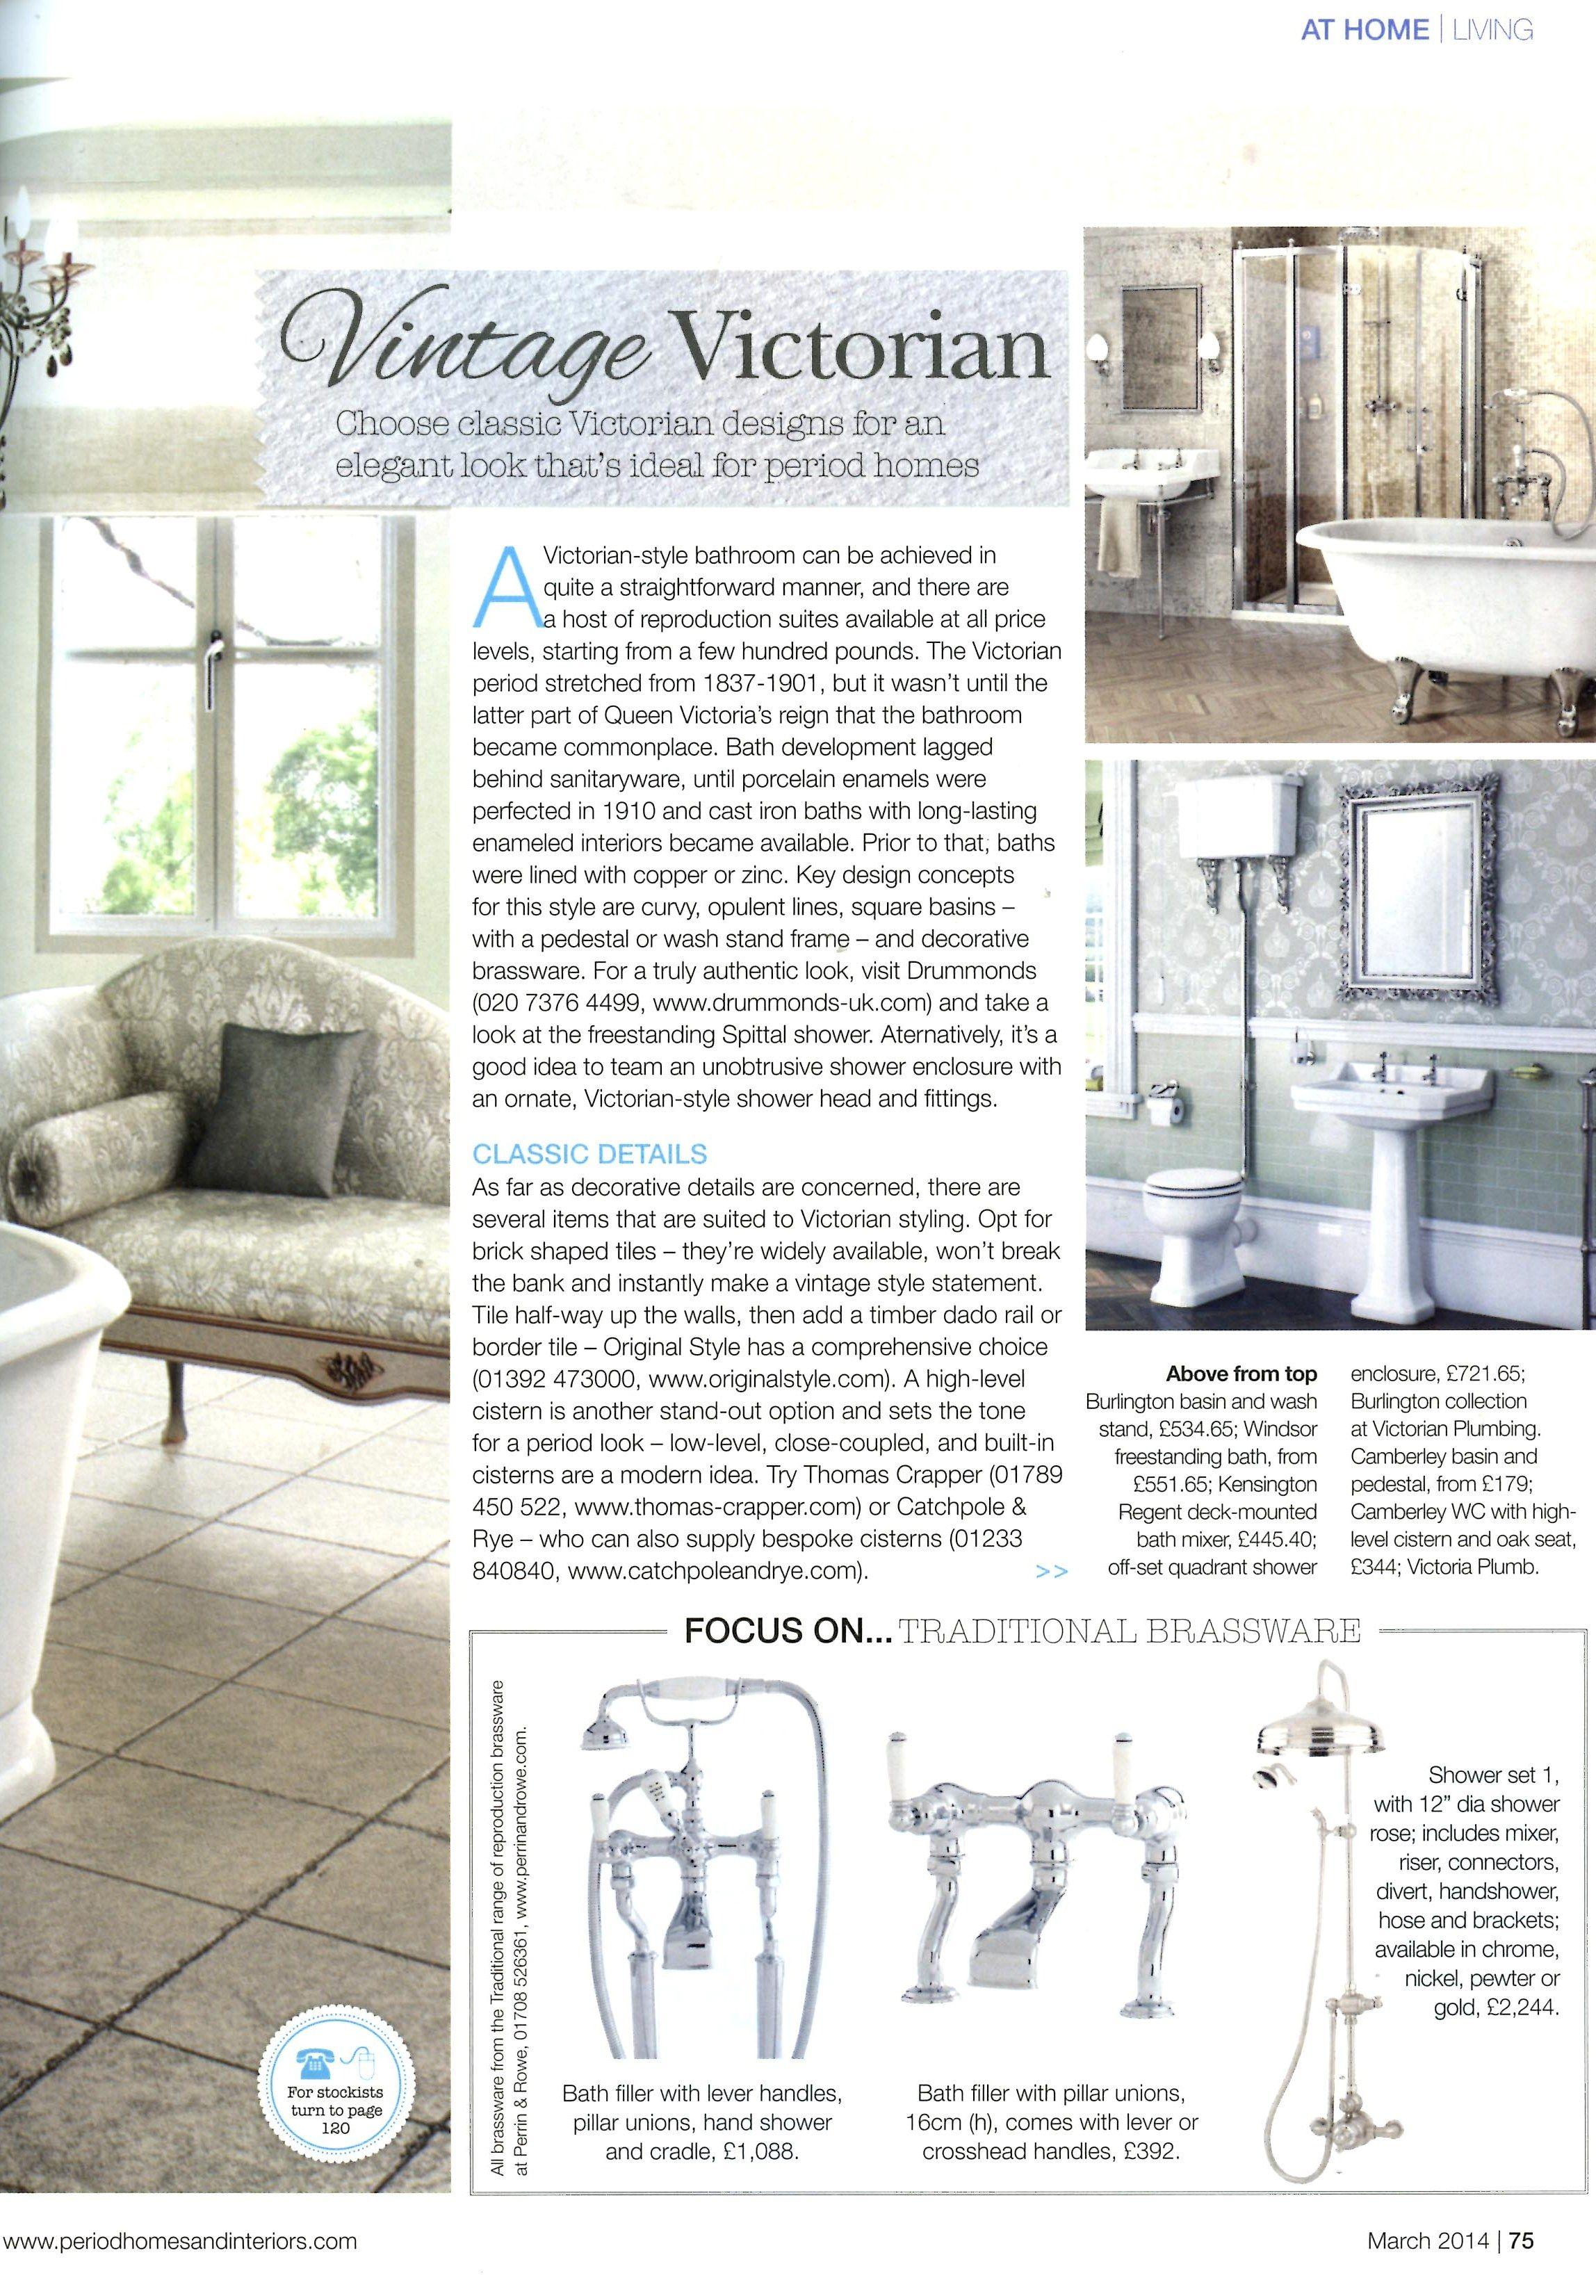 Classic bathroom looks from Drummonds drummonds-uk.com Period Homes ...